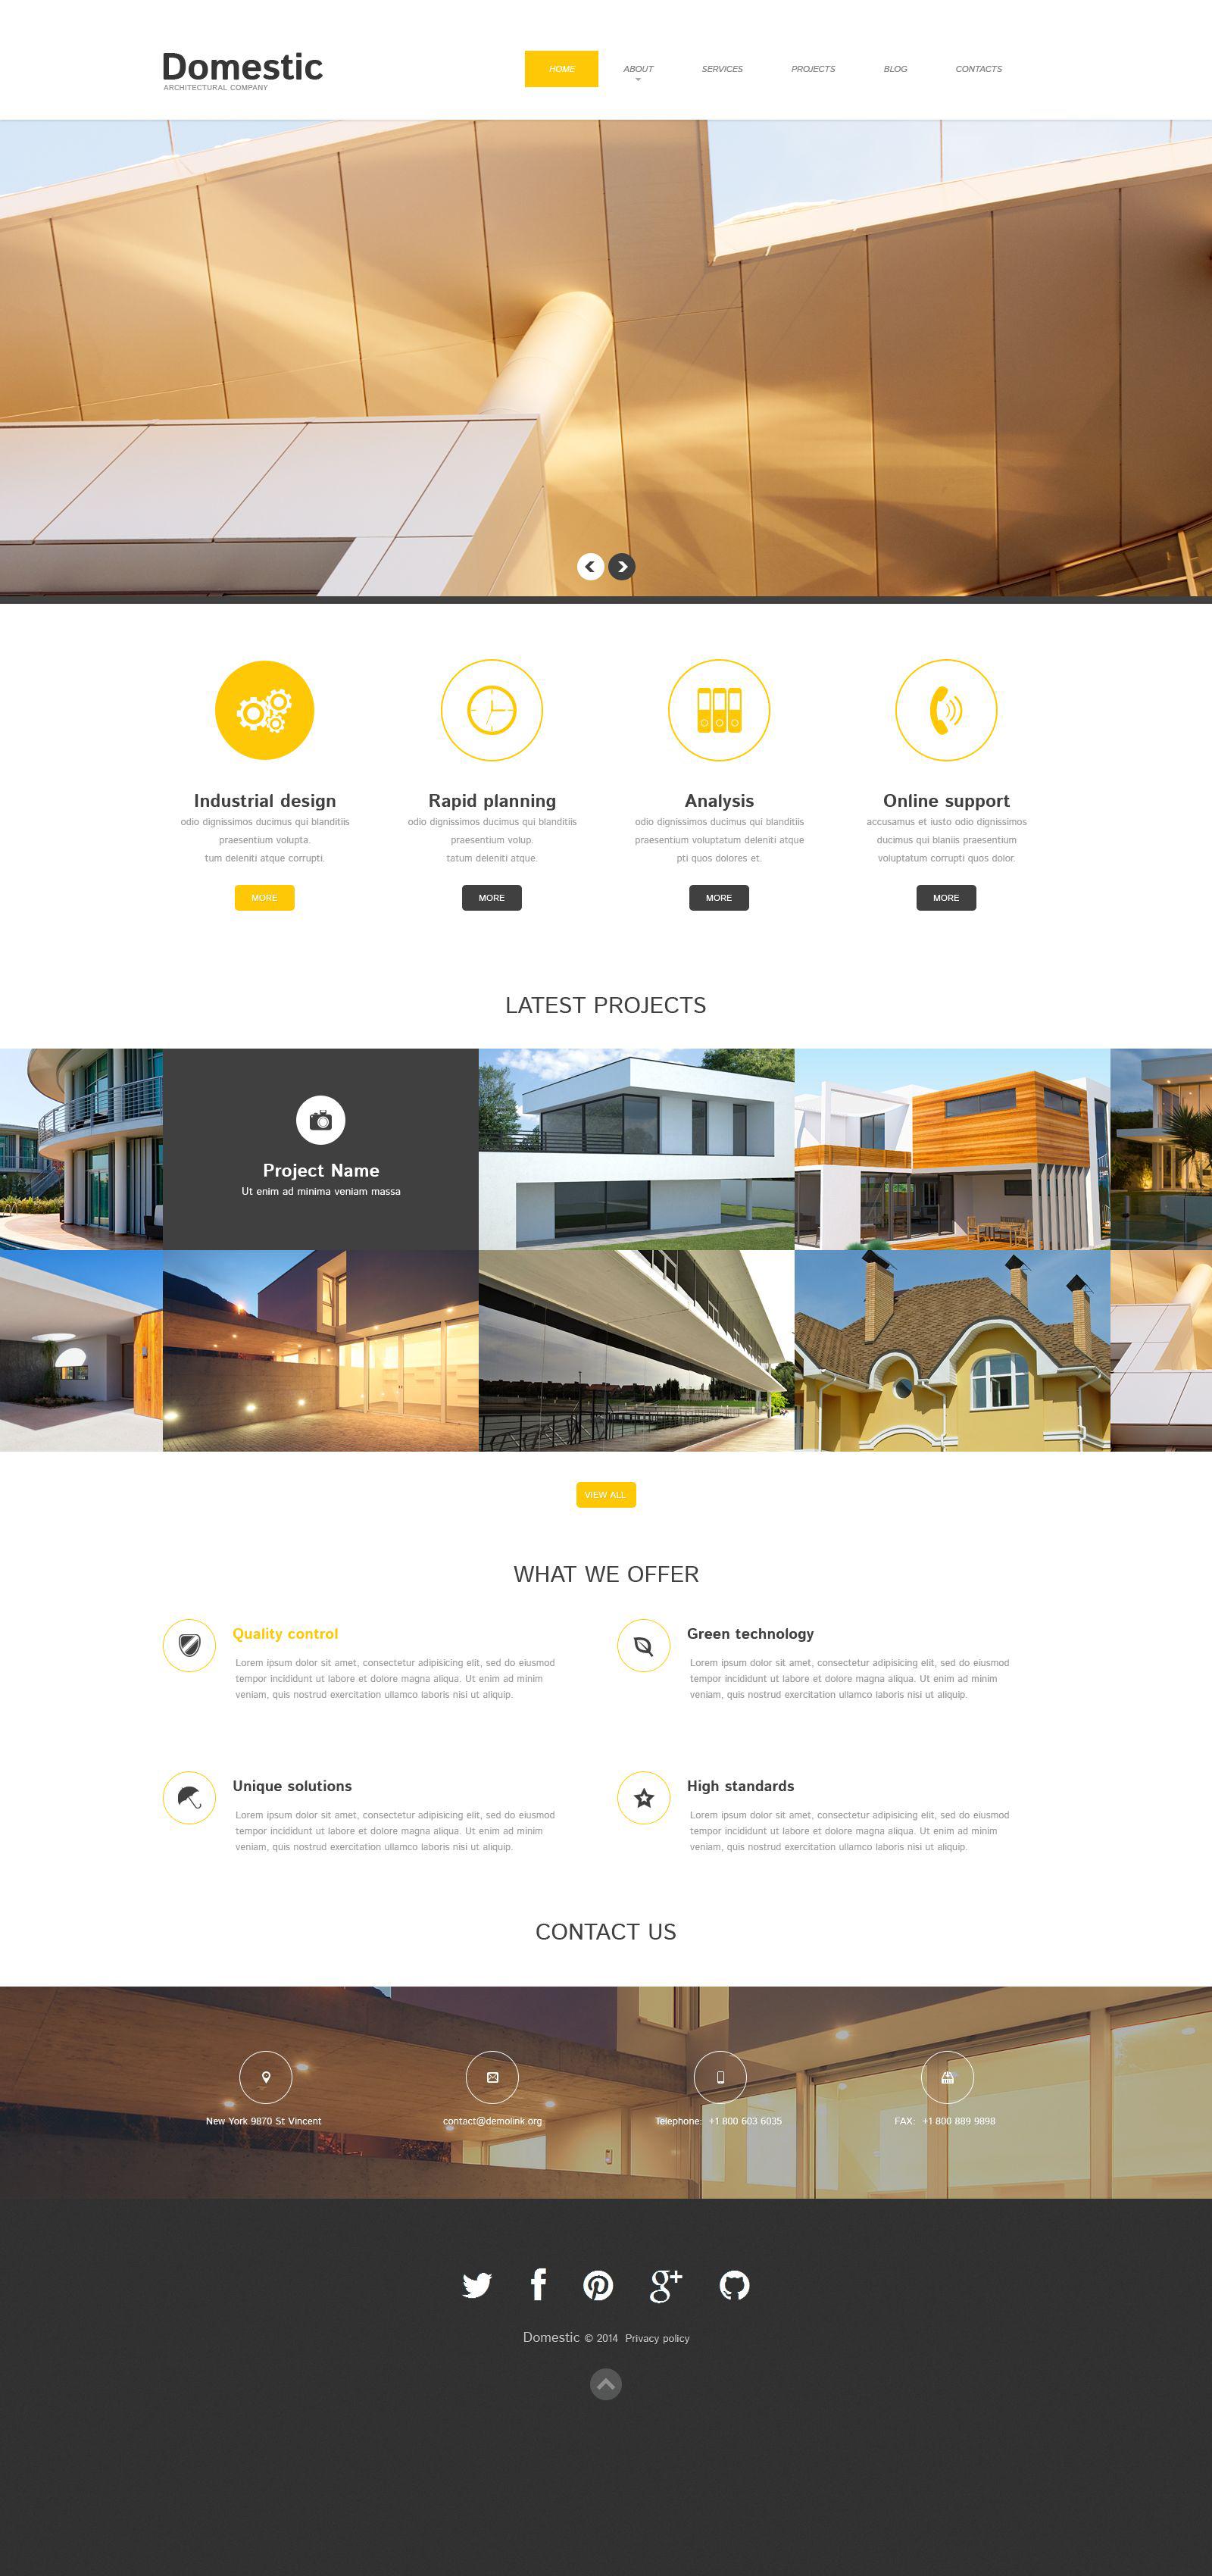 Domestic PSD Template - screenshot